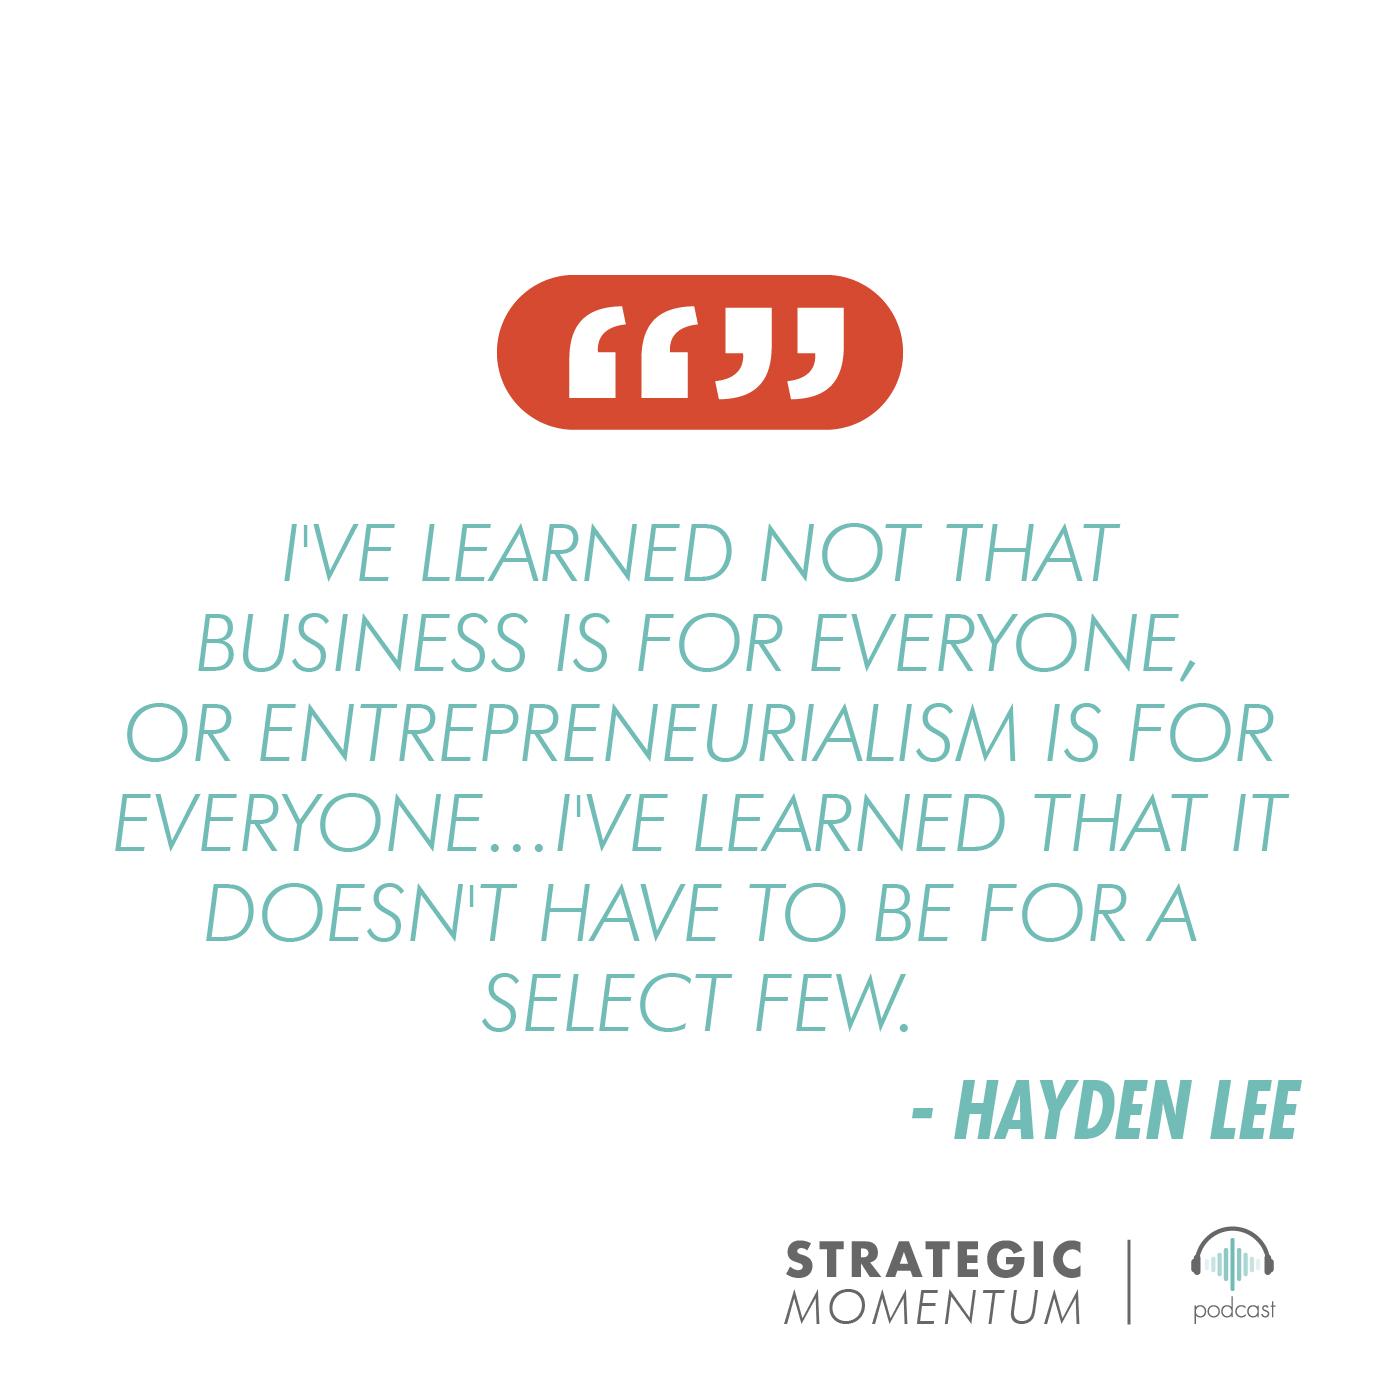 Hayden Lee Quote | Strategic Momentum Podcast